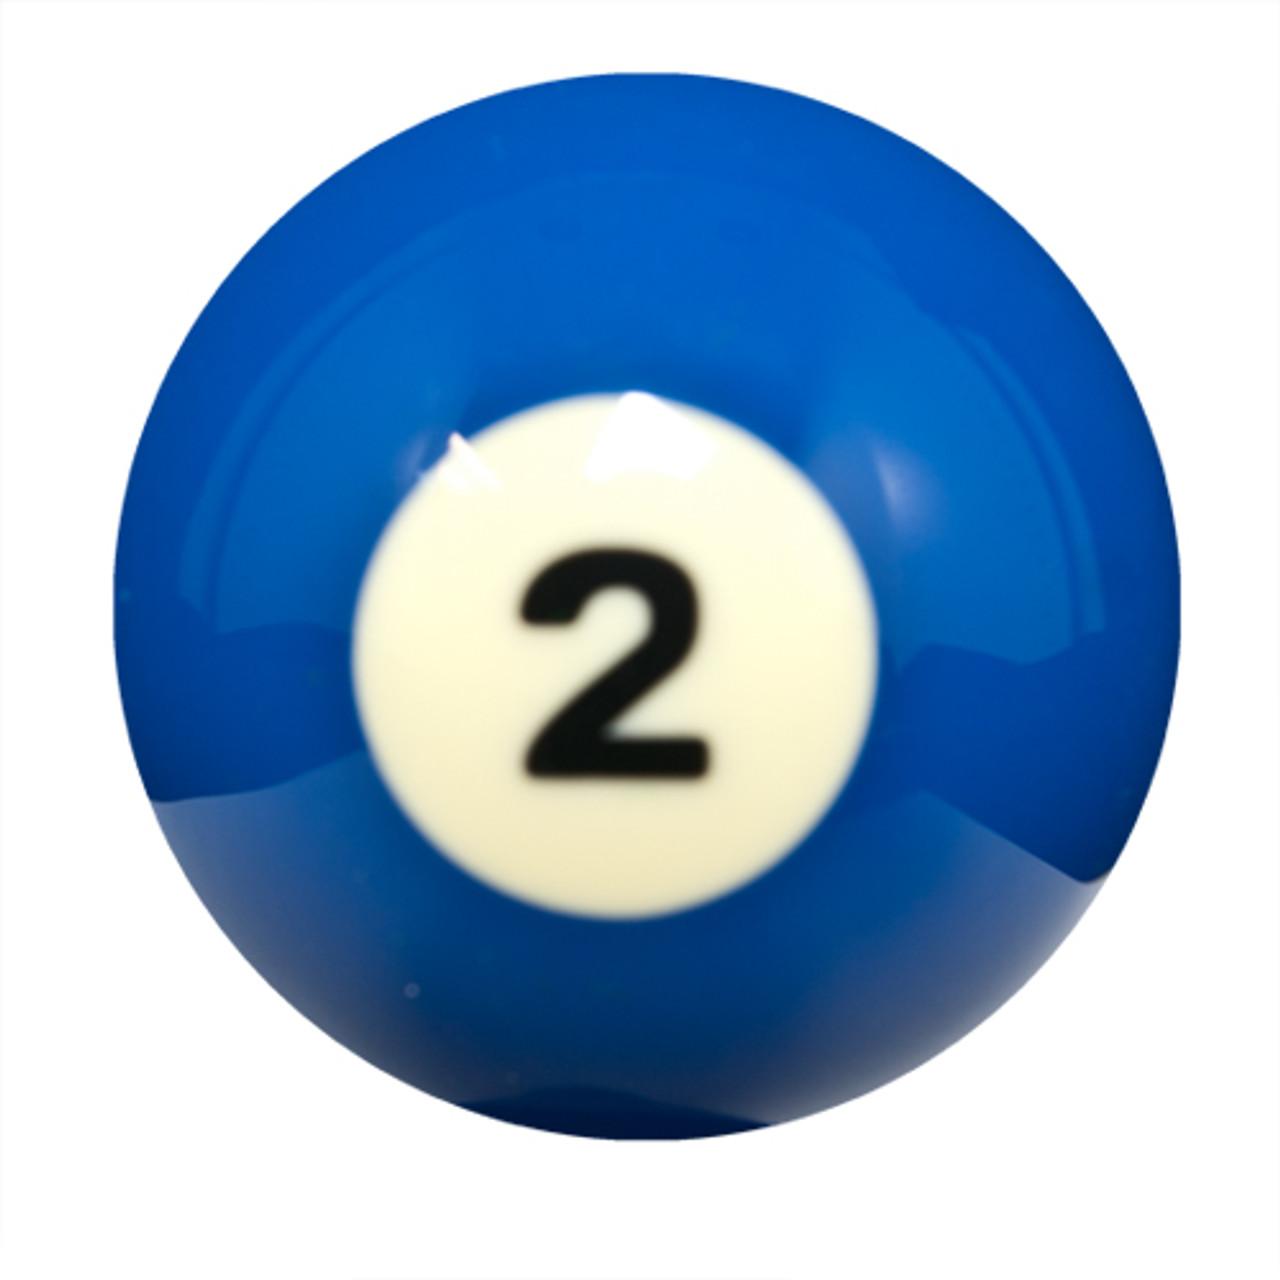 Sterling Replacement Billiard Balls #2